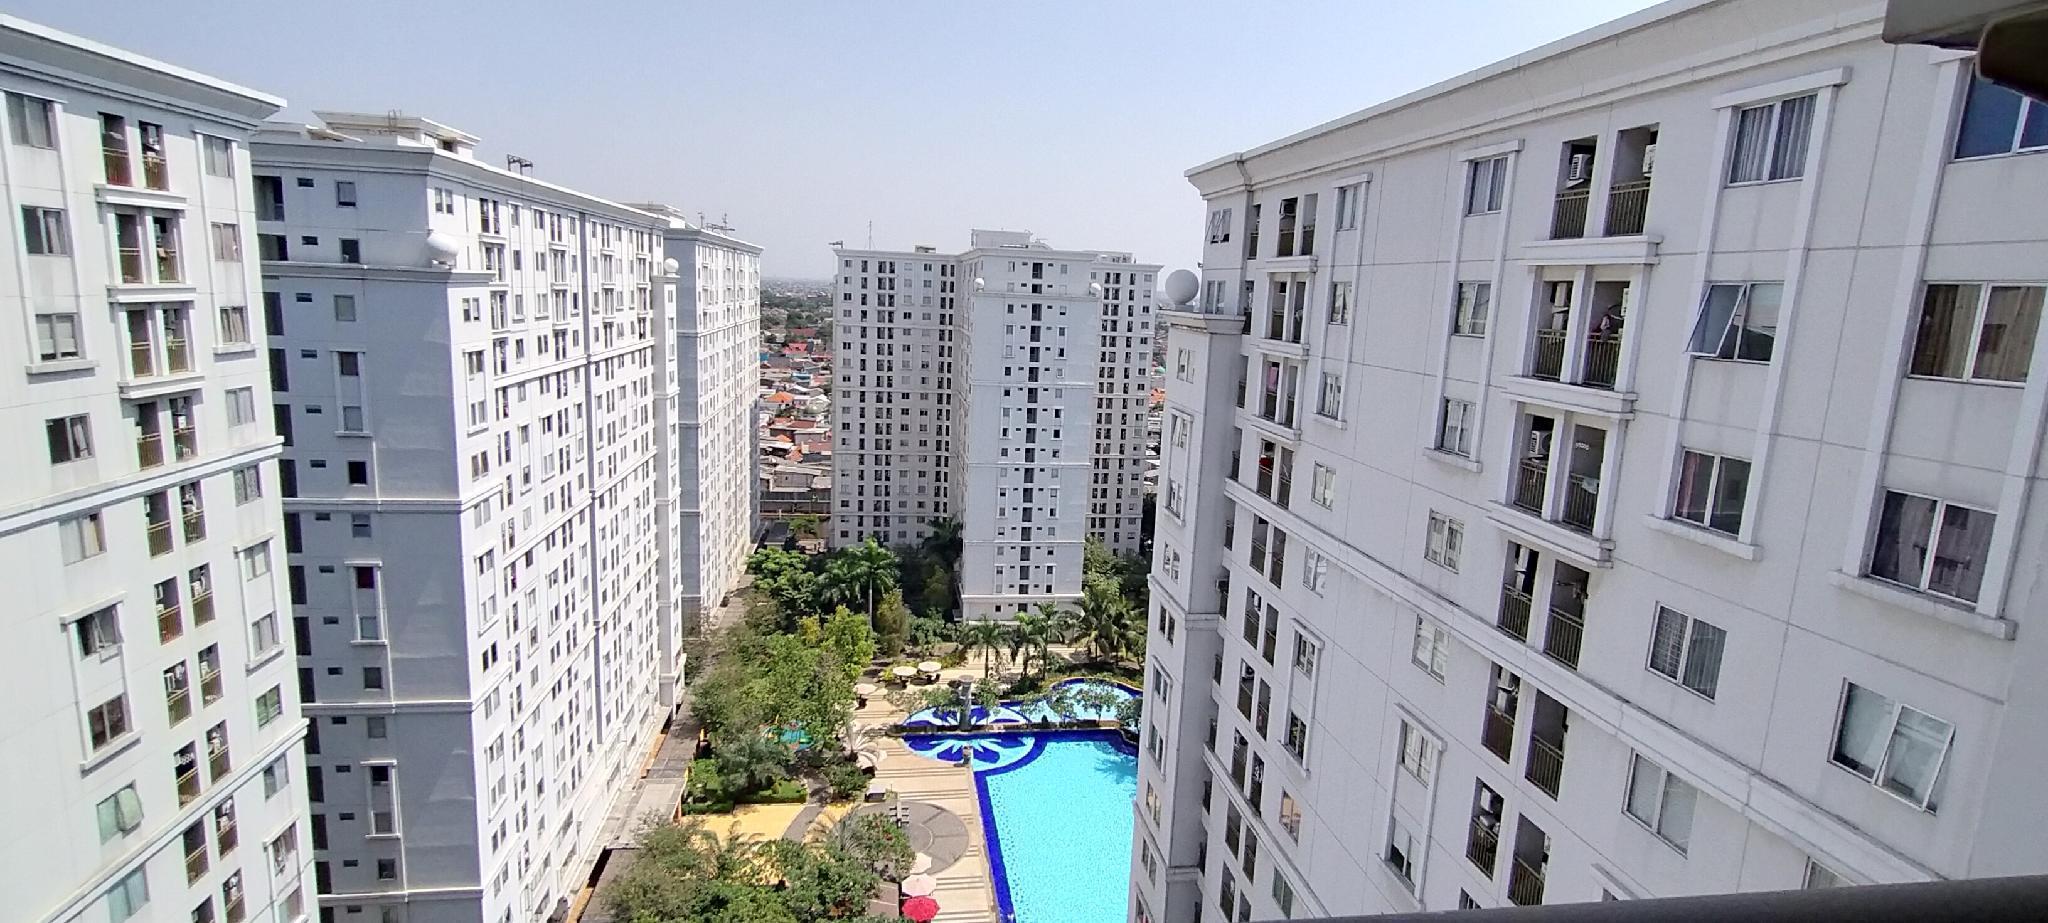 Apartemen Green Palace Kalibata City By Ocean